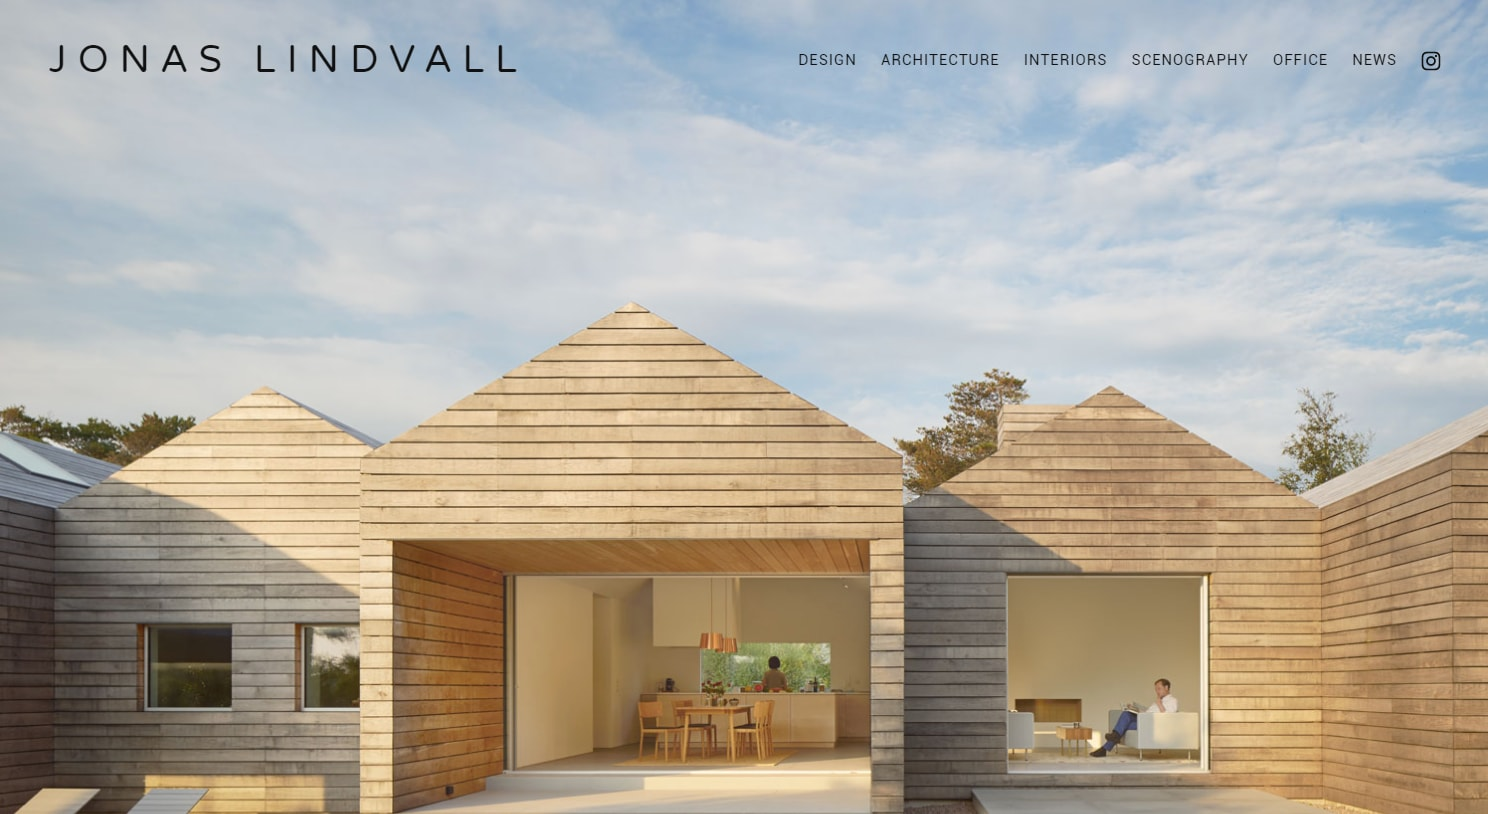 minimalist web design with photography